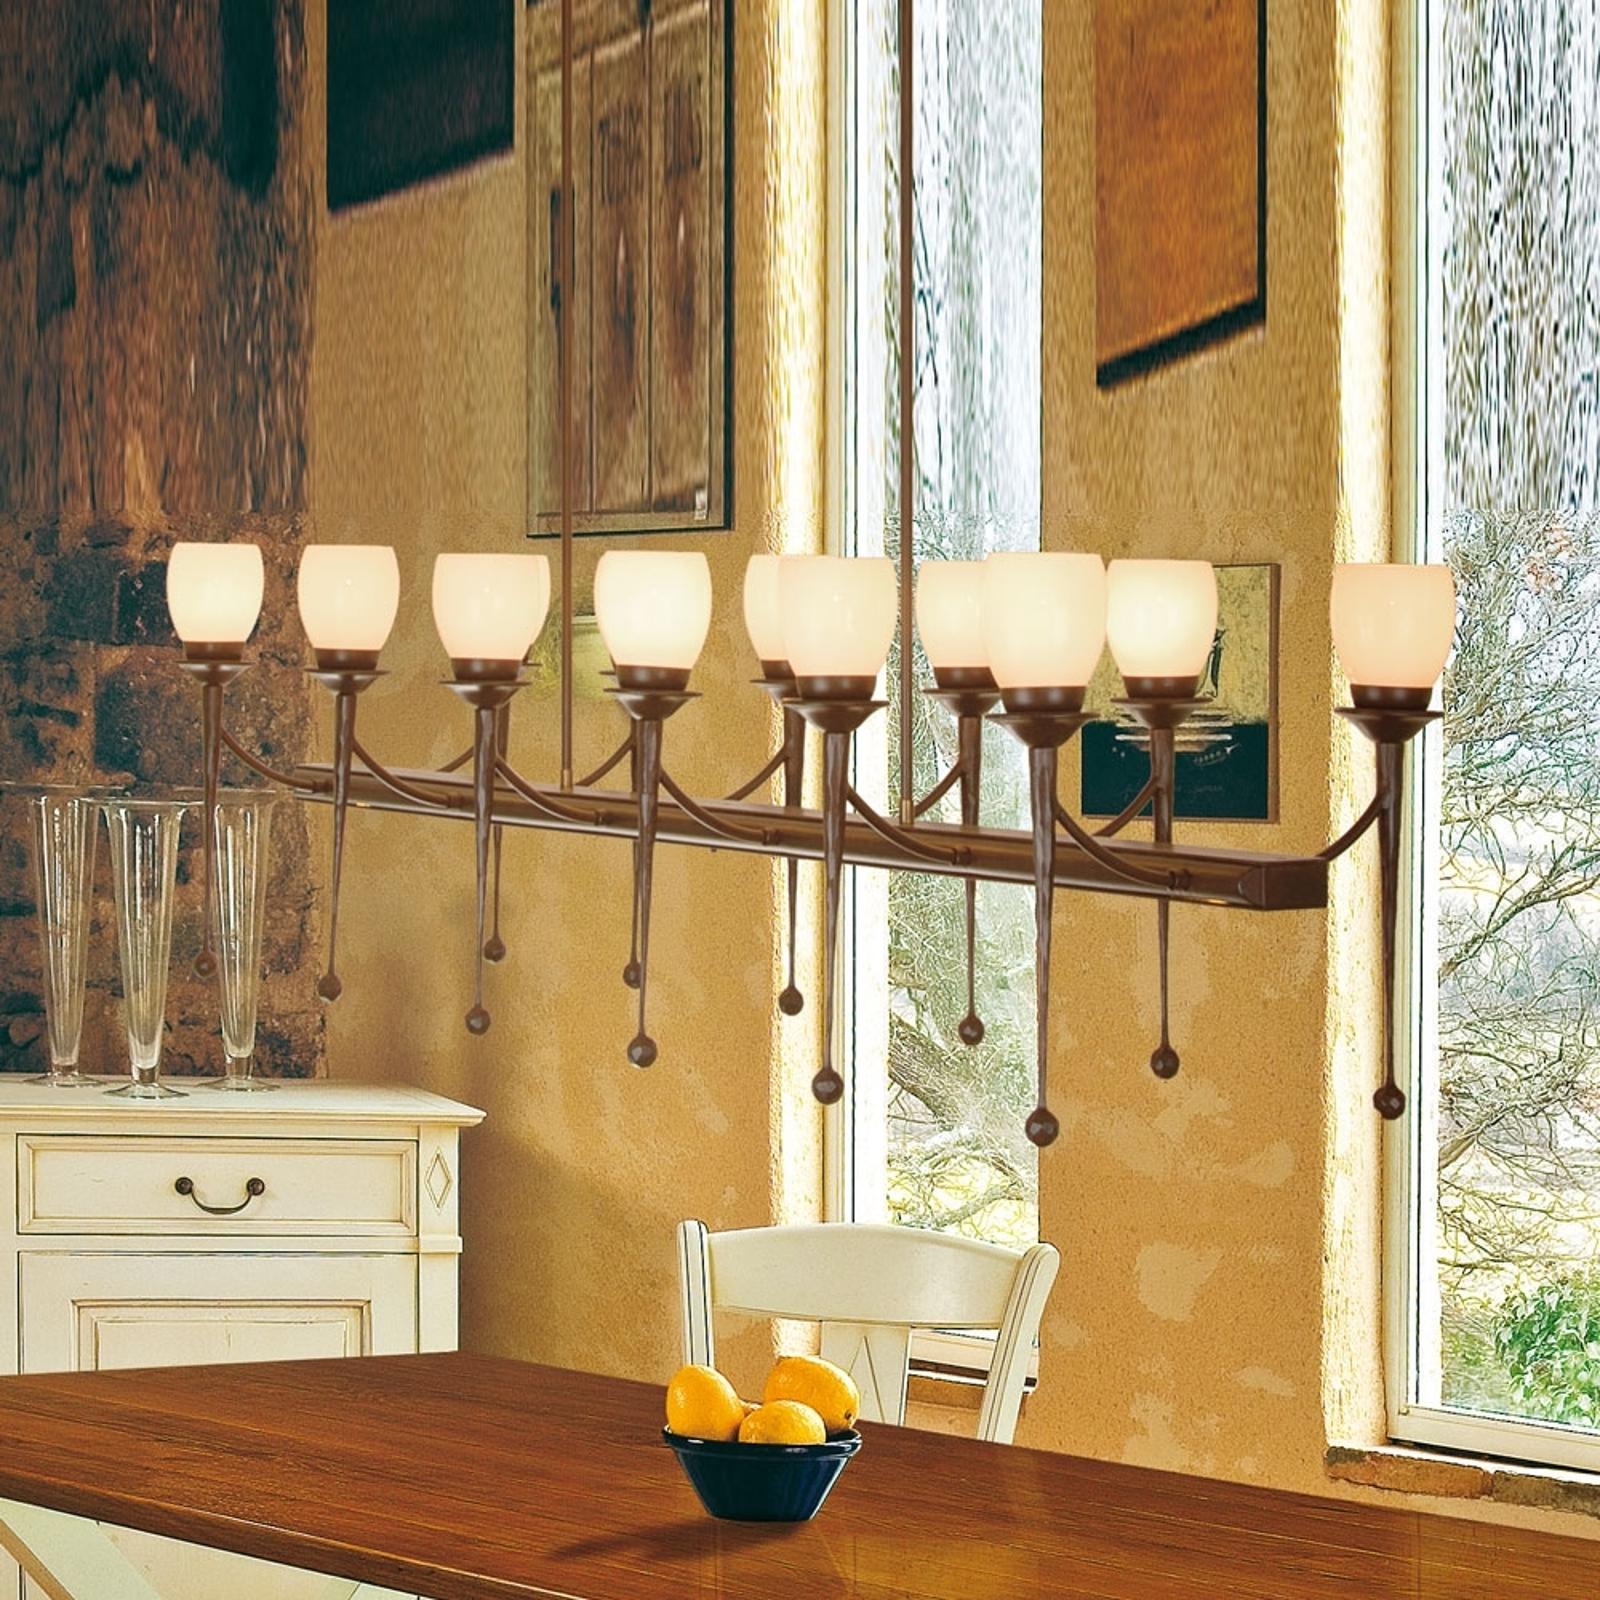 Menzel Chateau -riippuvalaisin, 12-lamppuinen